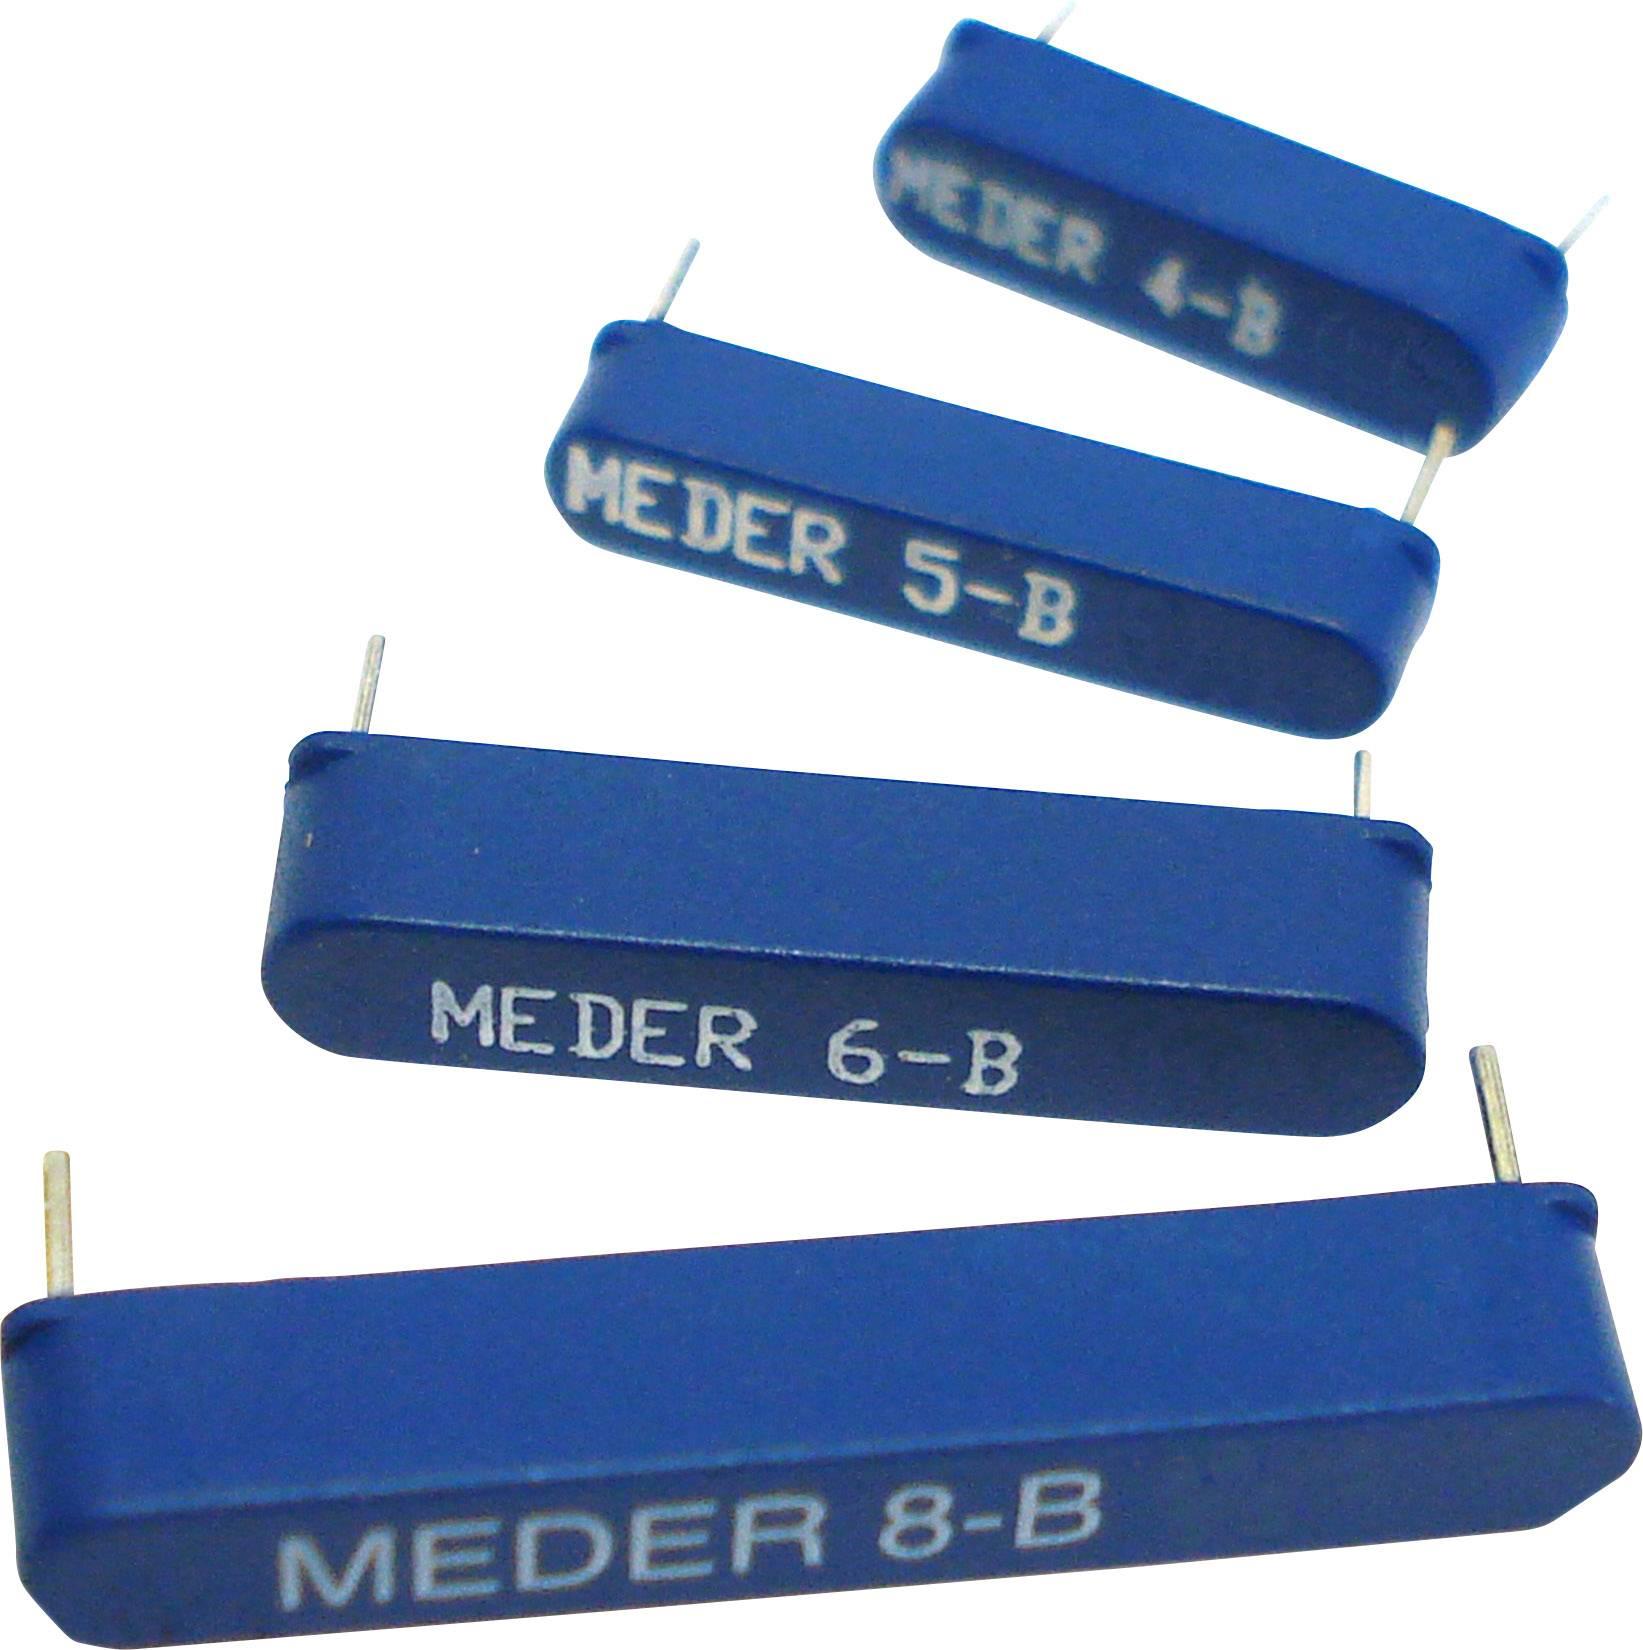 STANDEXMEDER   MK6-8-B   REED SENSOR